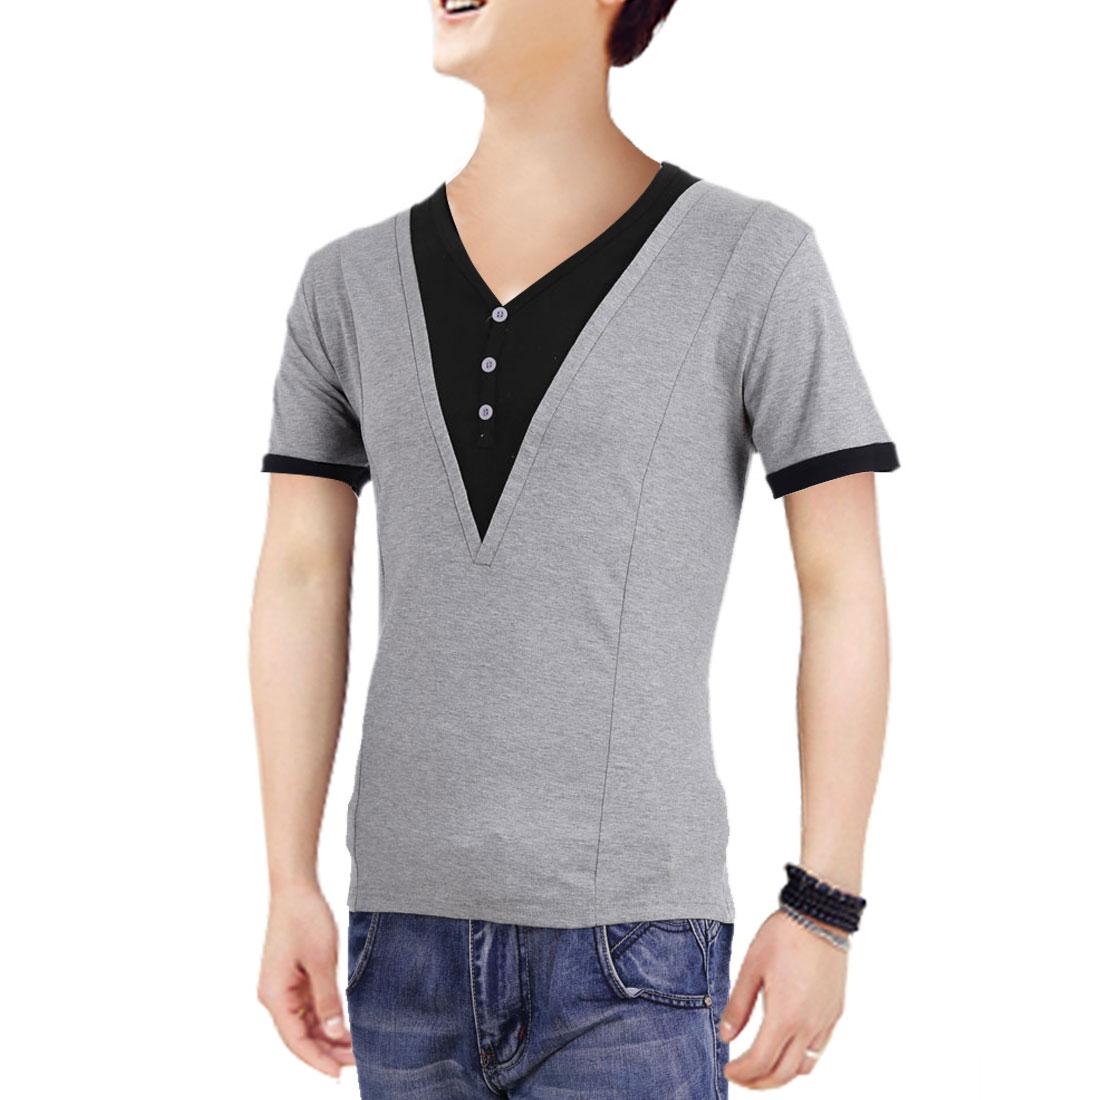 Men V Neck Short Sleeve Panel Stretchy Shirt Light Gray M